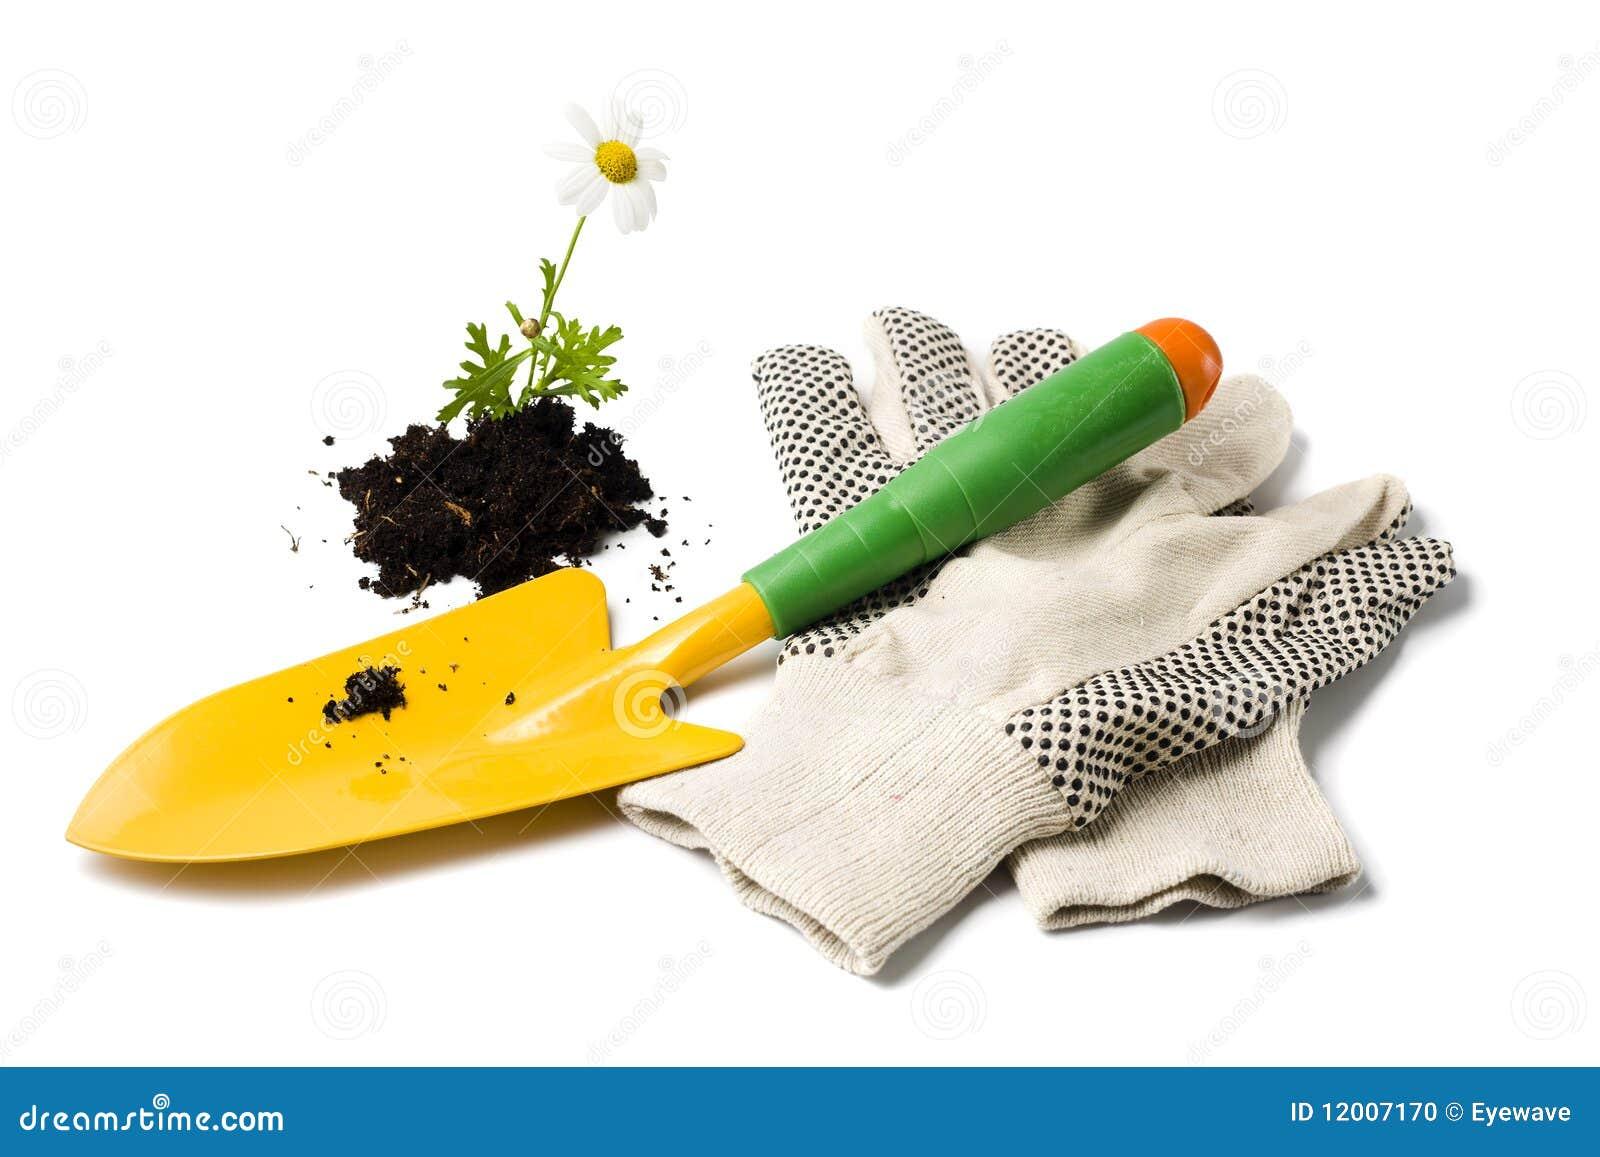 Gardening Shovel And Gloves Stock Image